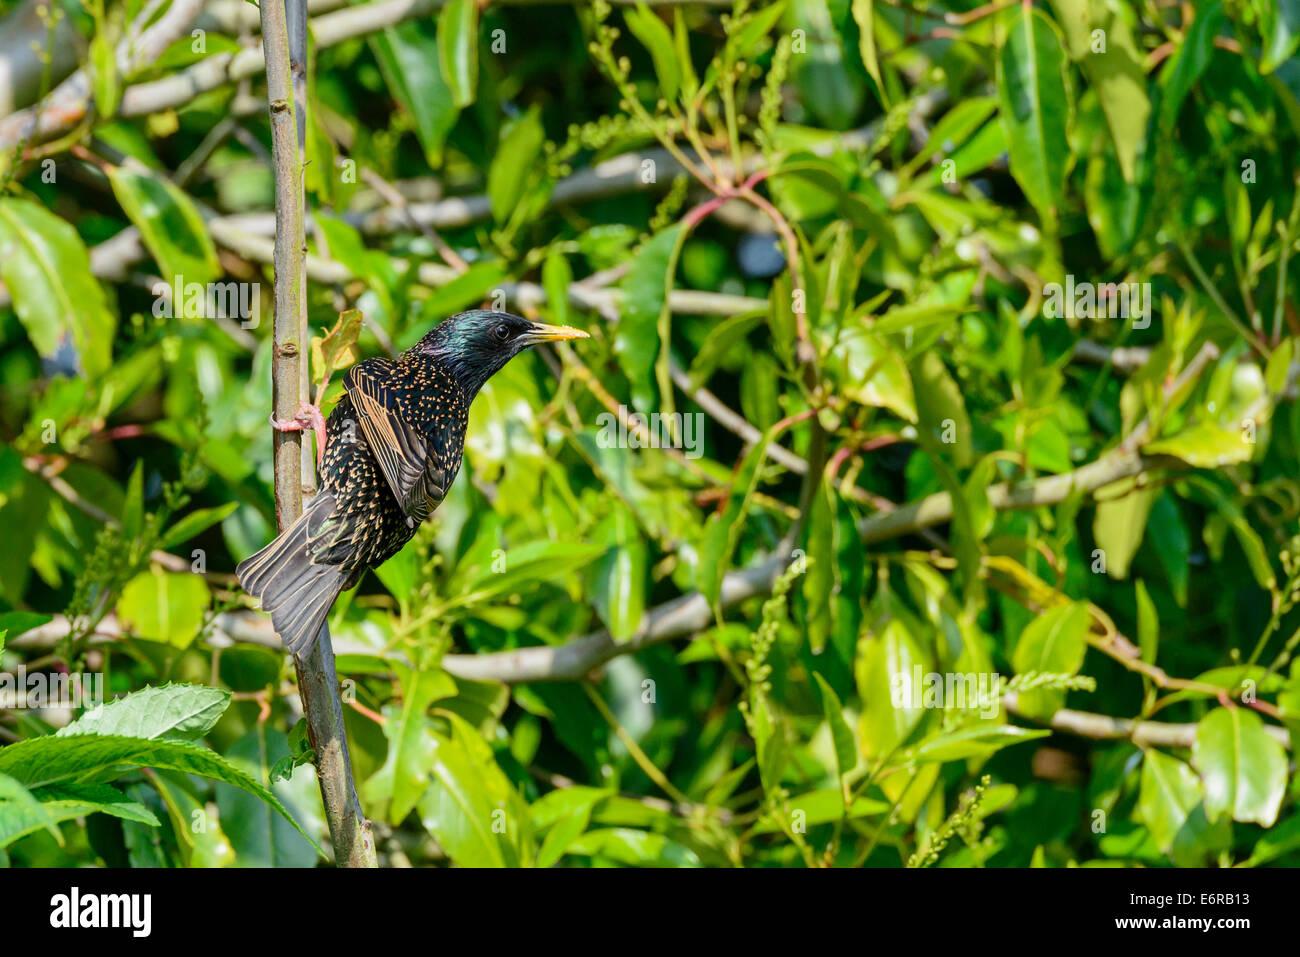 A wild adult common starling (Sturnus vulgaris) bird perching perches on a bush in an urban British garden. - Stock Image